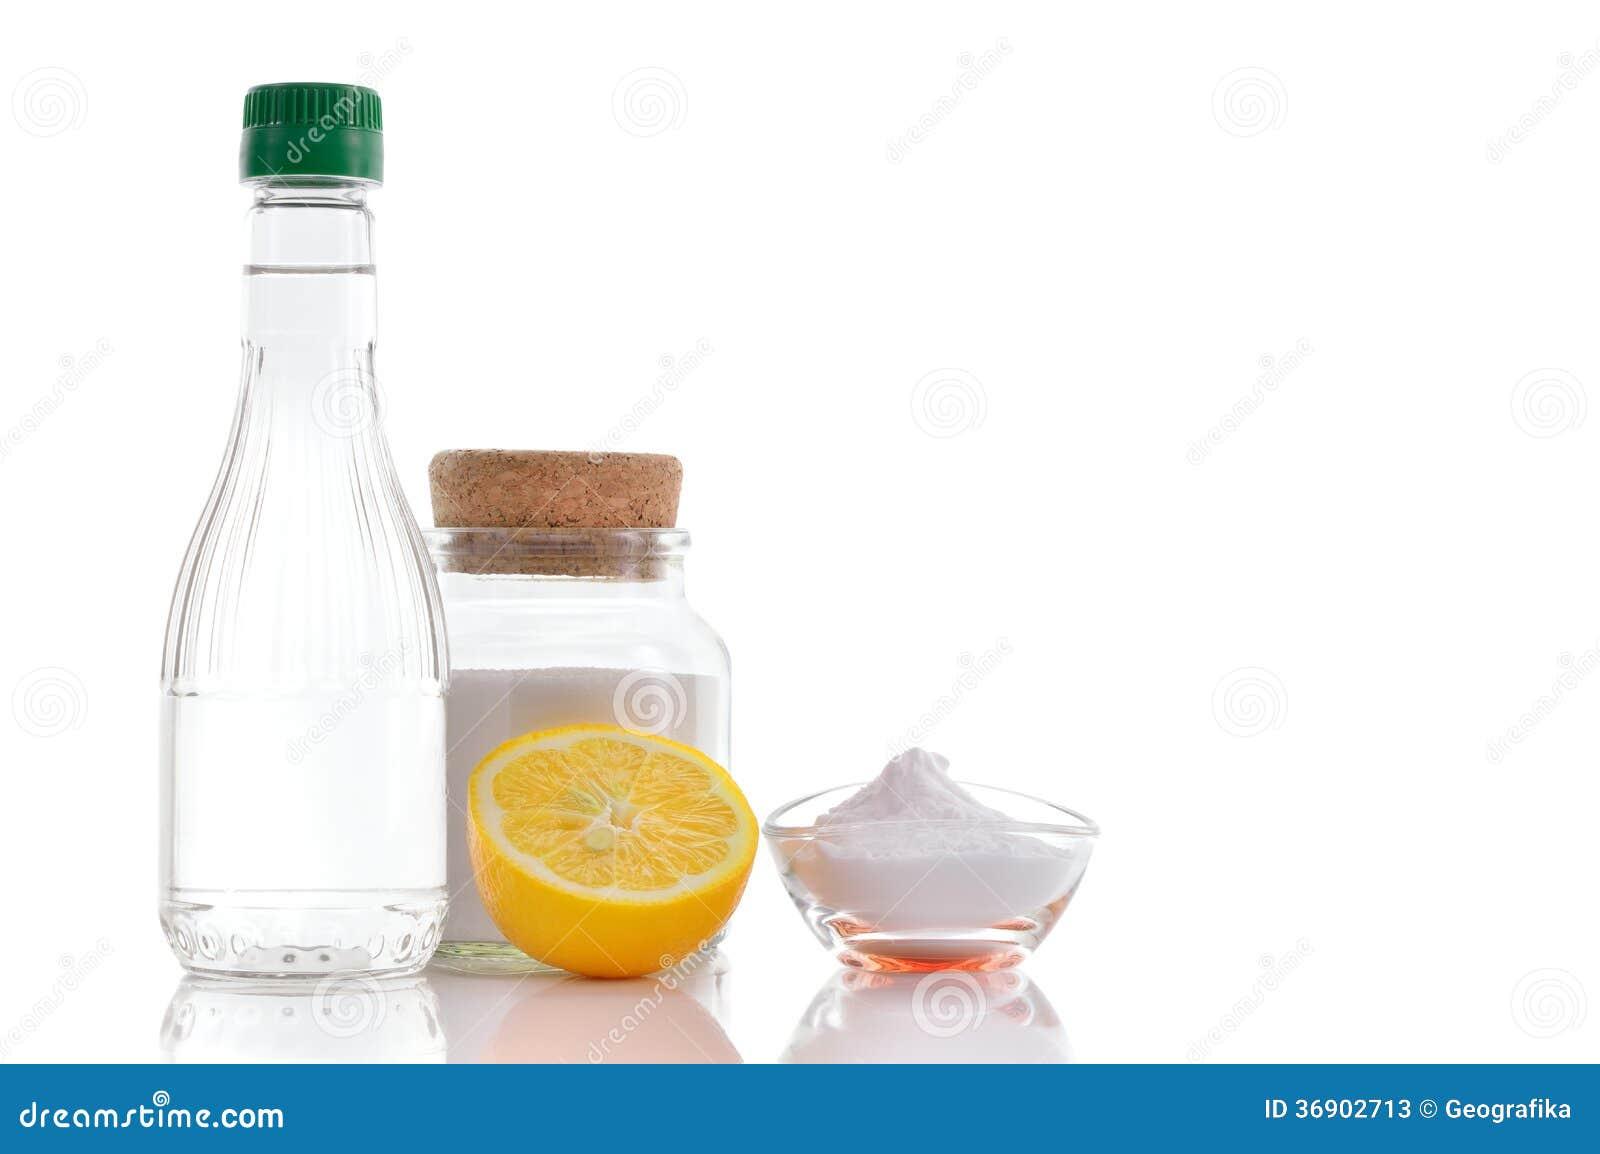 Natural Cleaners Vinegar Baking Soda Salt And Lemon